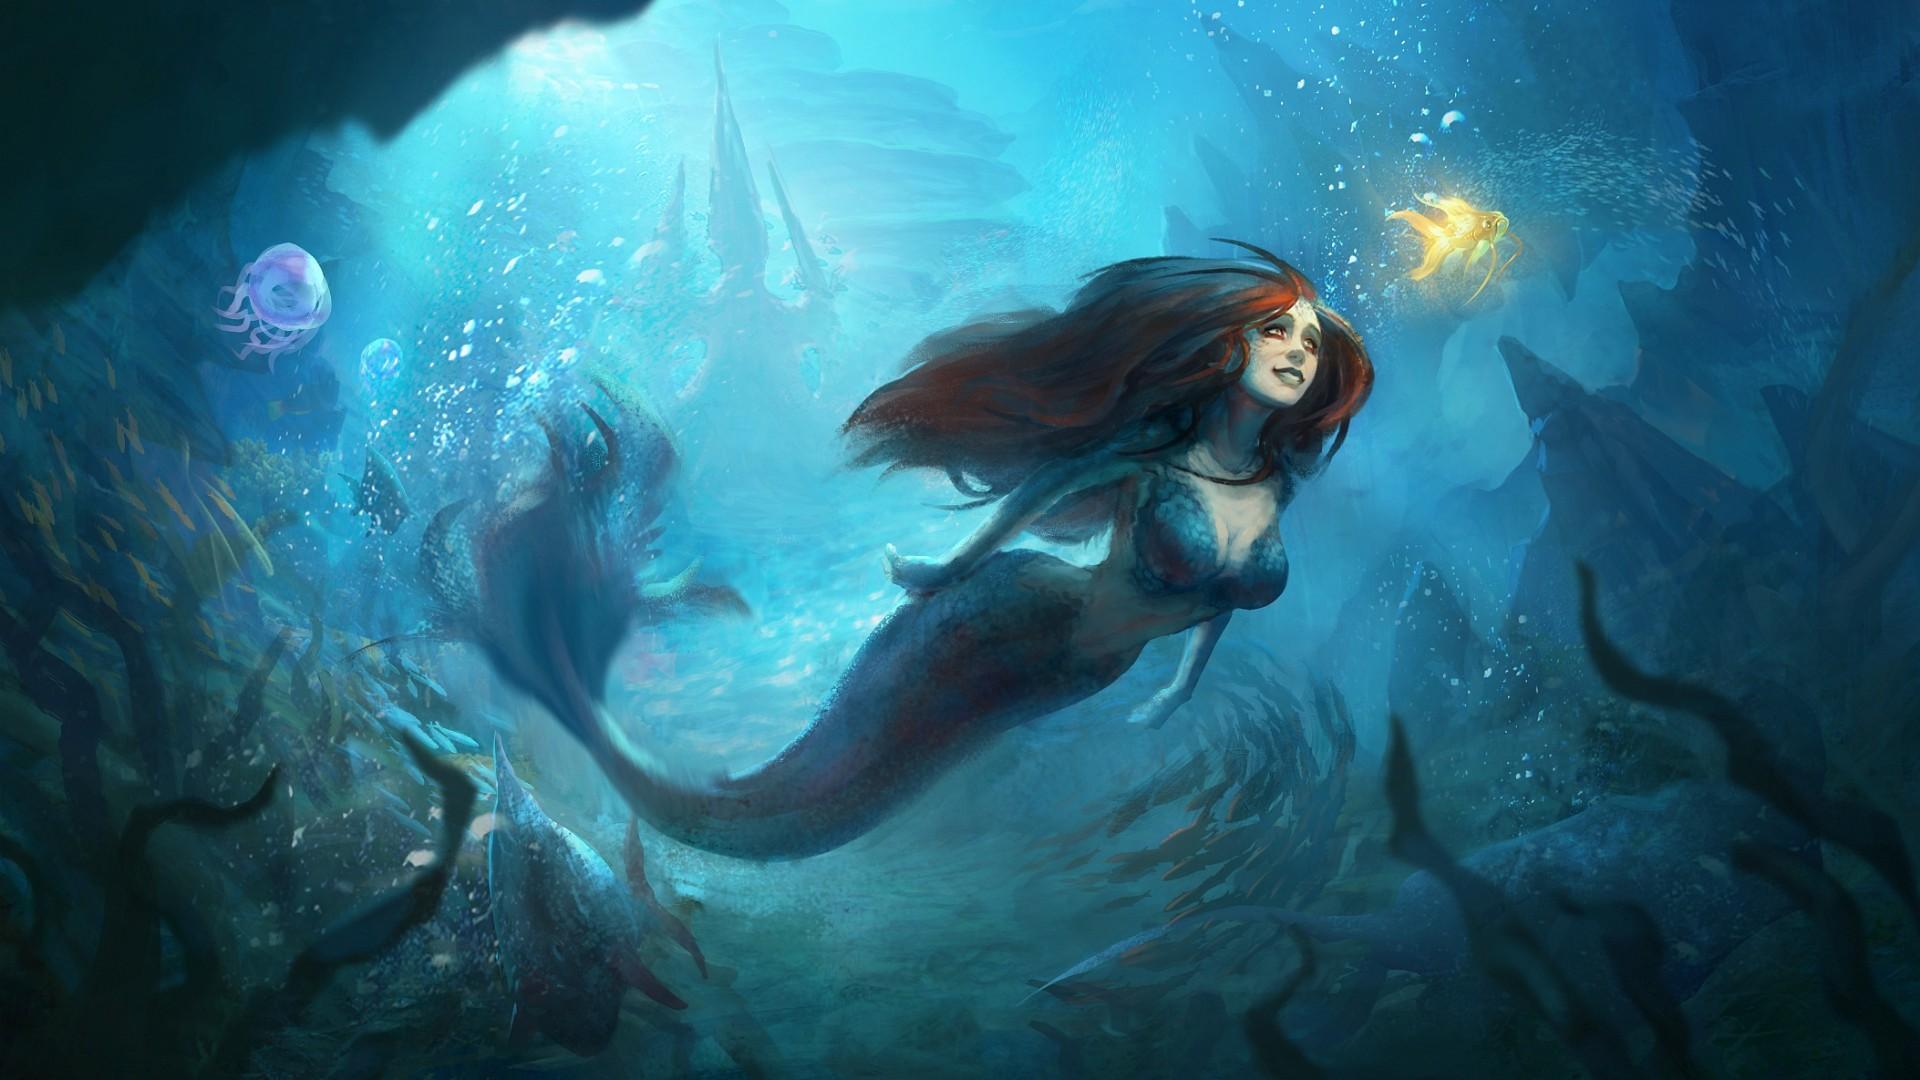 Mermaid - Underwater fantasy world wallpaper